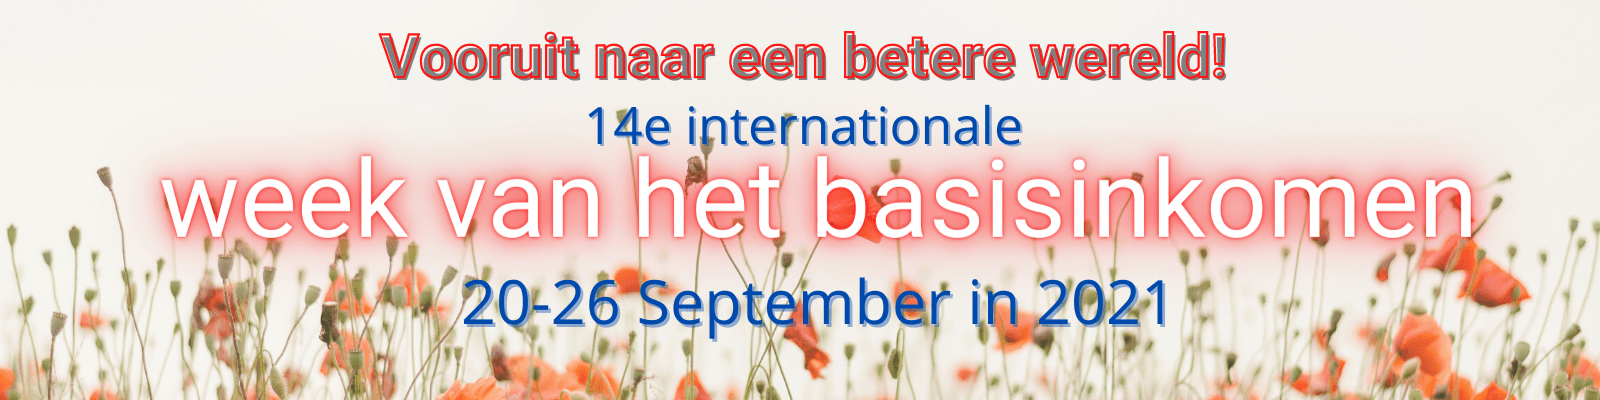 14e internationale week van het basisinkomen 20-26 september 2021